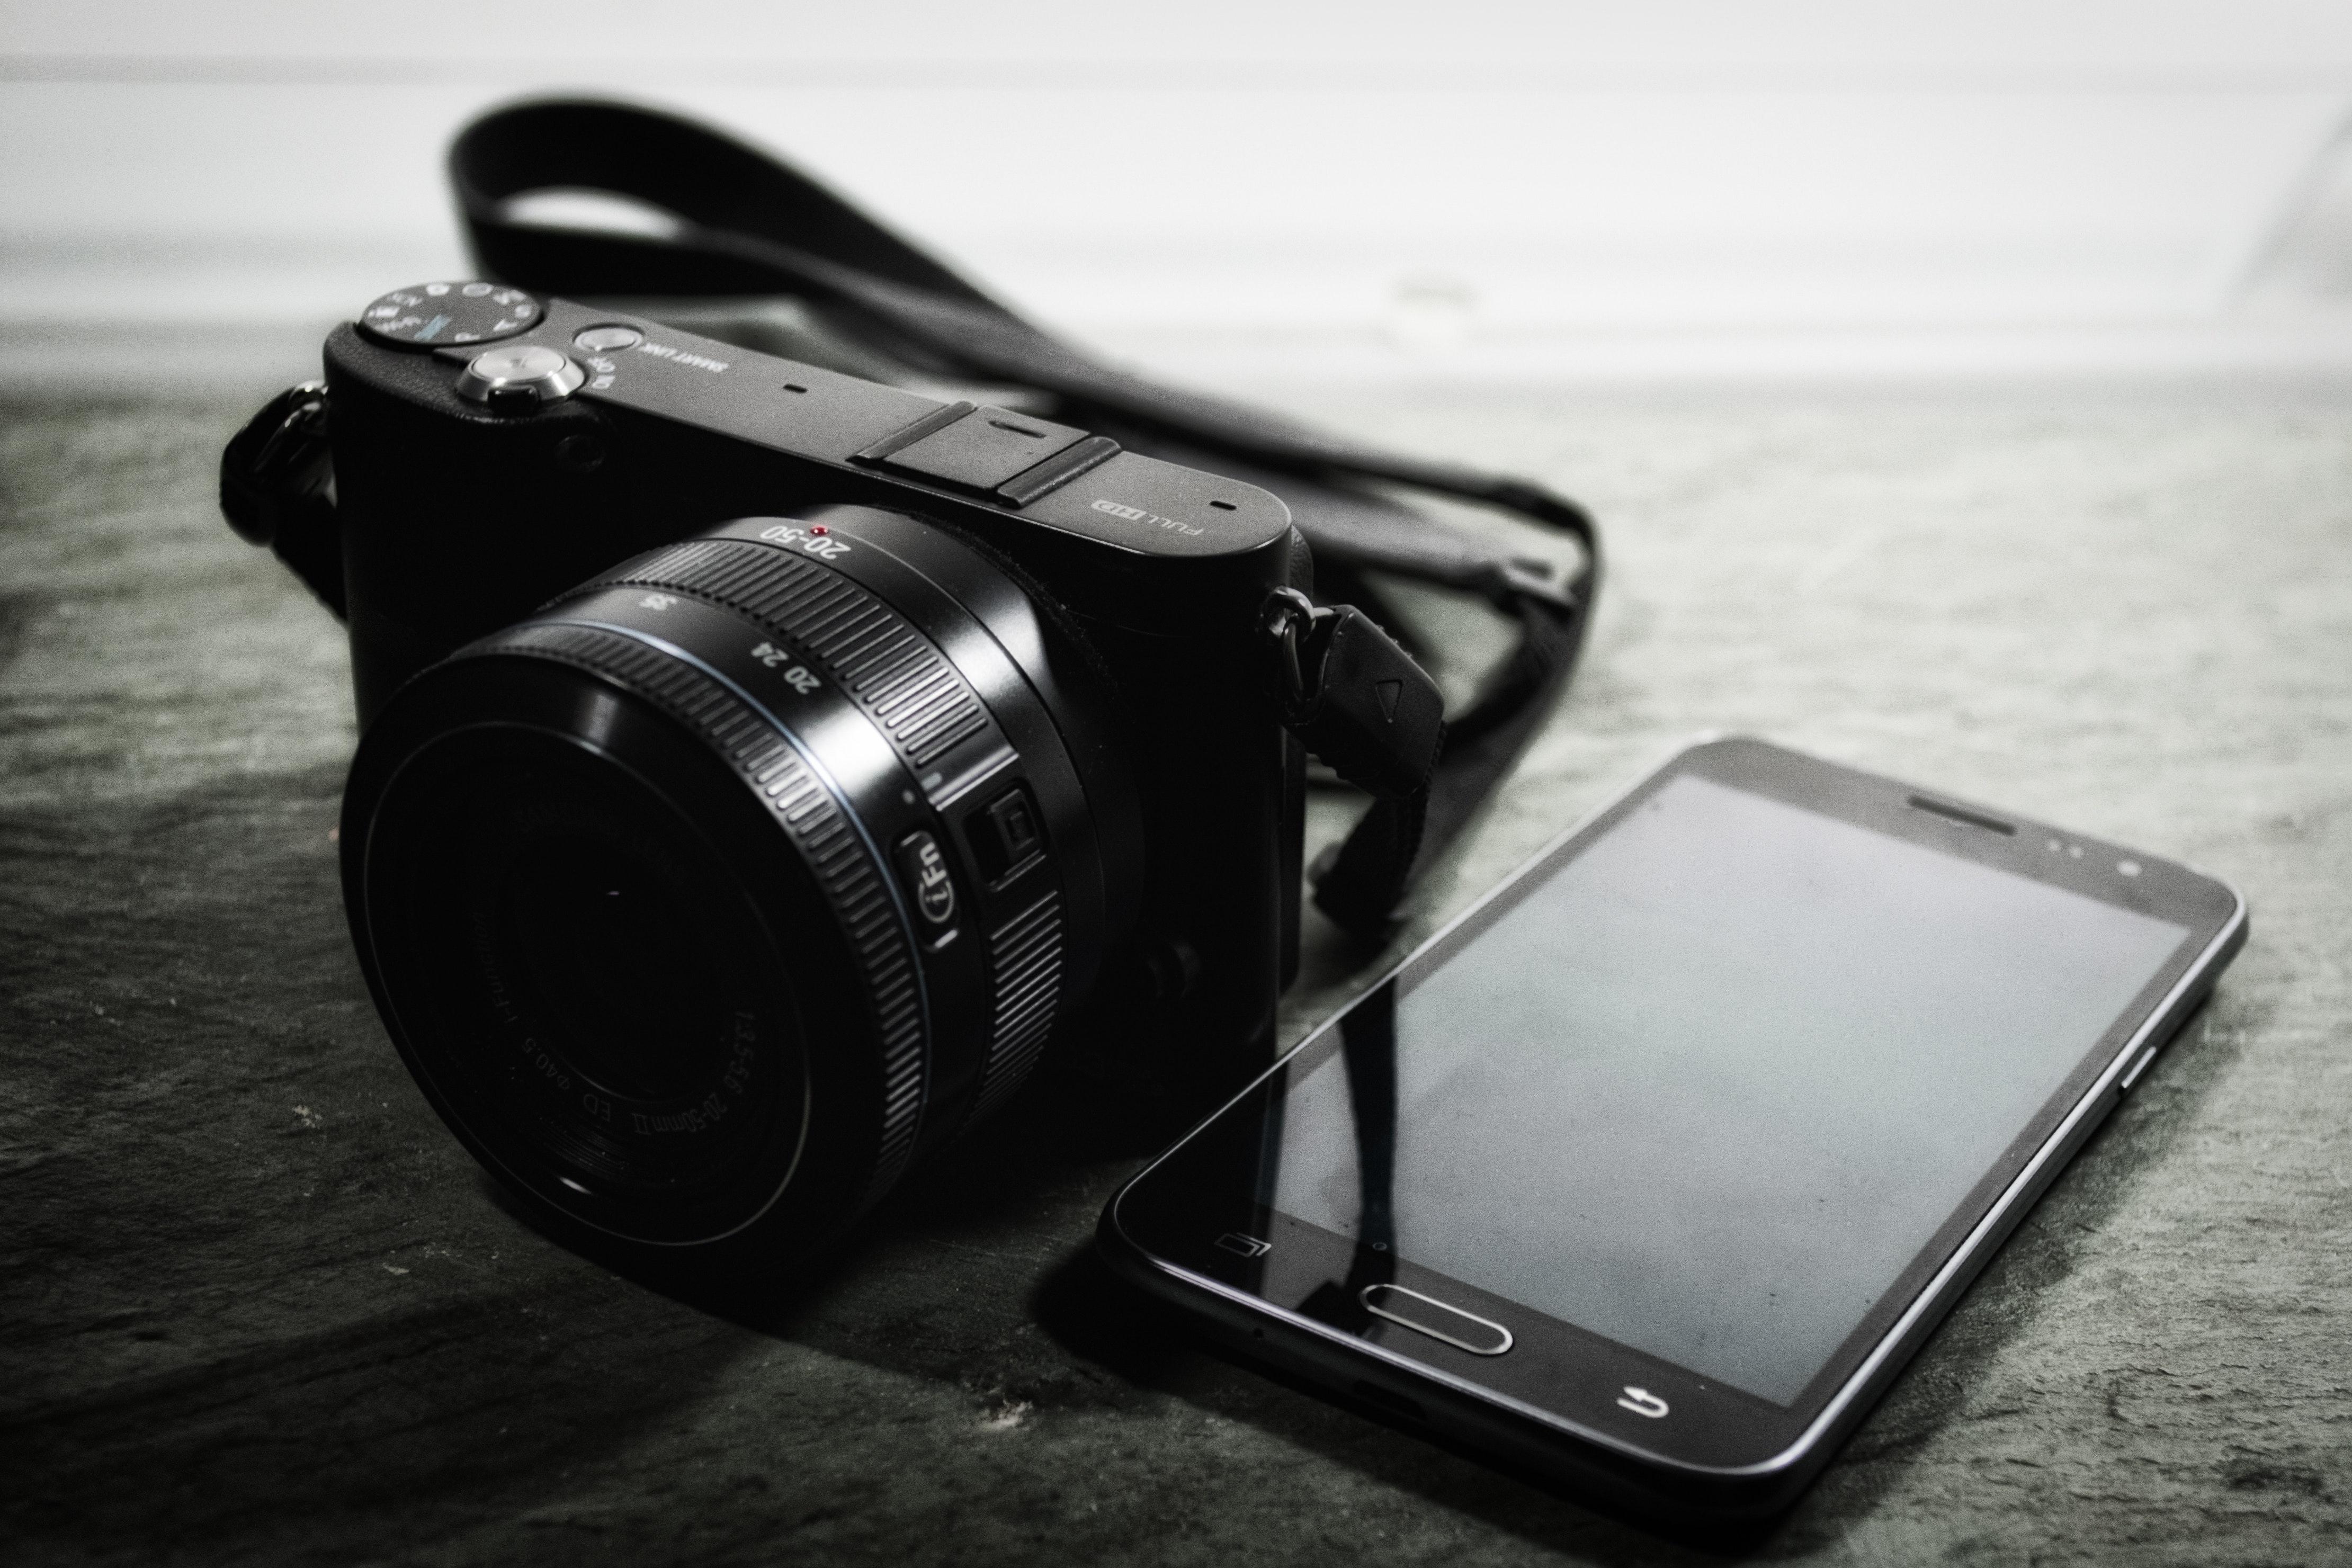 Bridge camera beside samsung smartphone photo